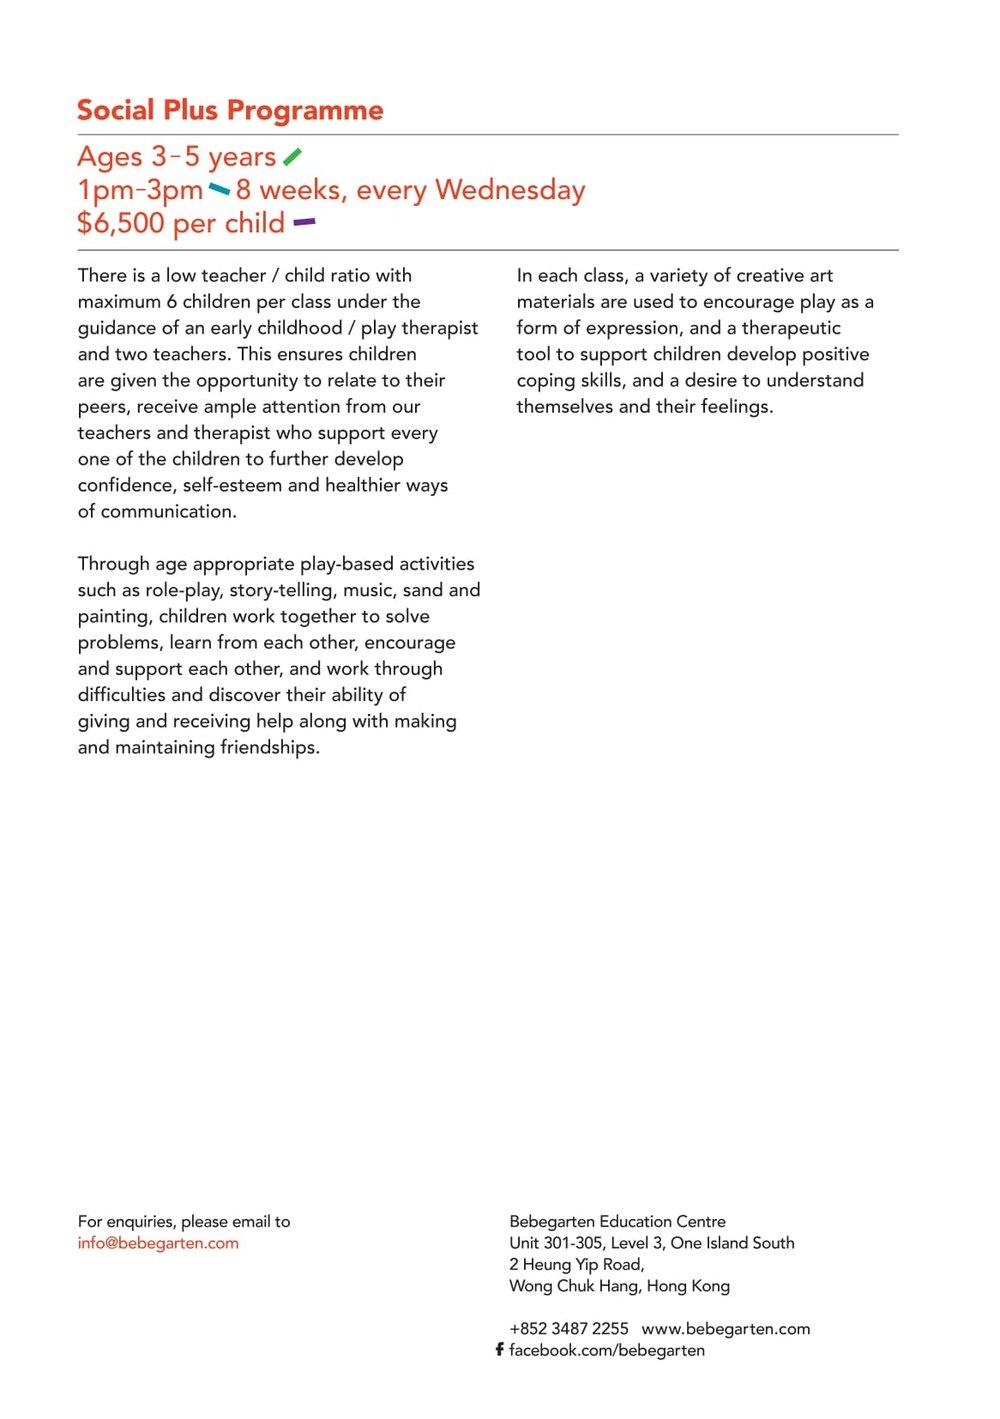 Social Plus Programme Leaflet_R-2.jpg